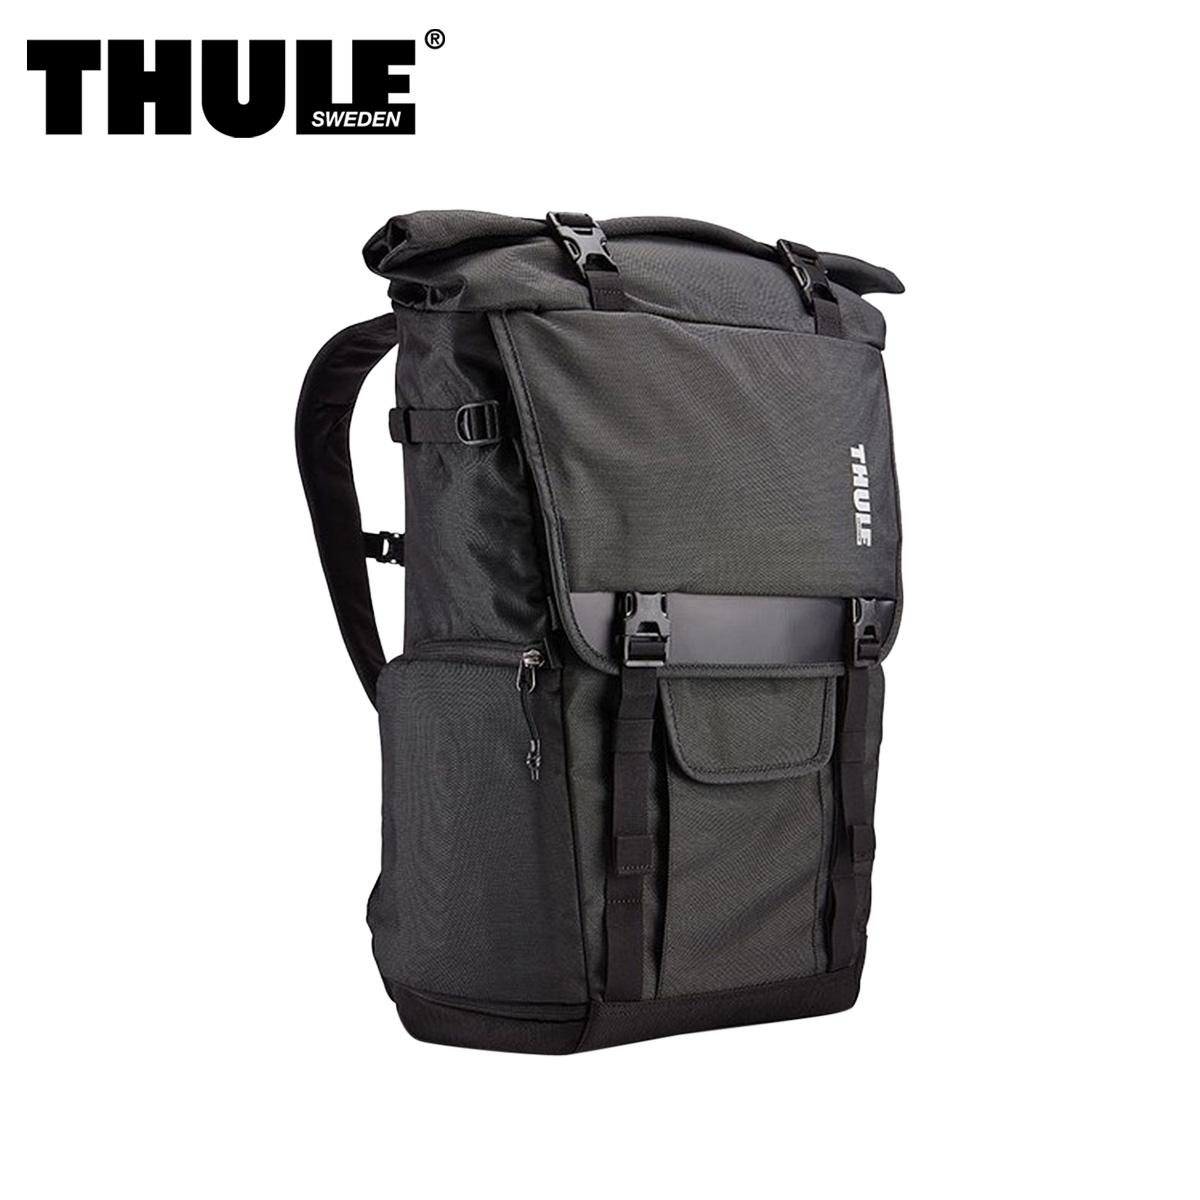 THULE COVERT DSLR BACKPACK スーリー リュック バッグ バックパック カバー メンズ レディース ダーク グレー 3201963